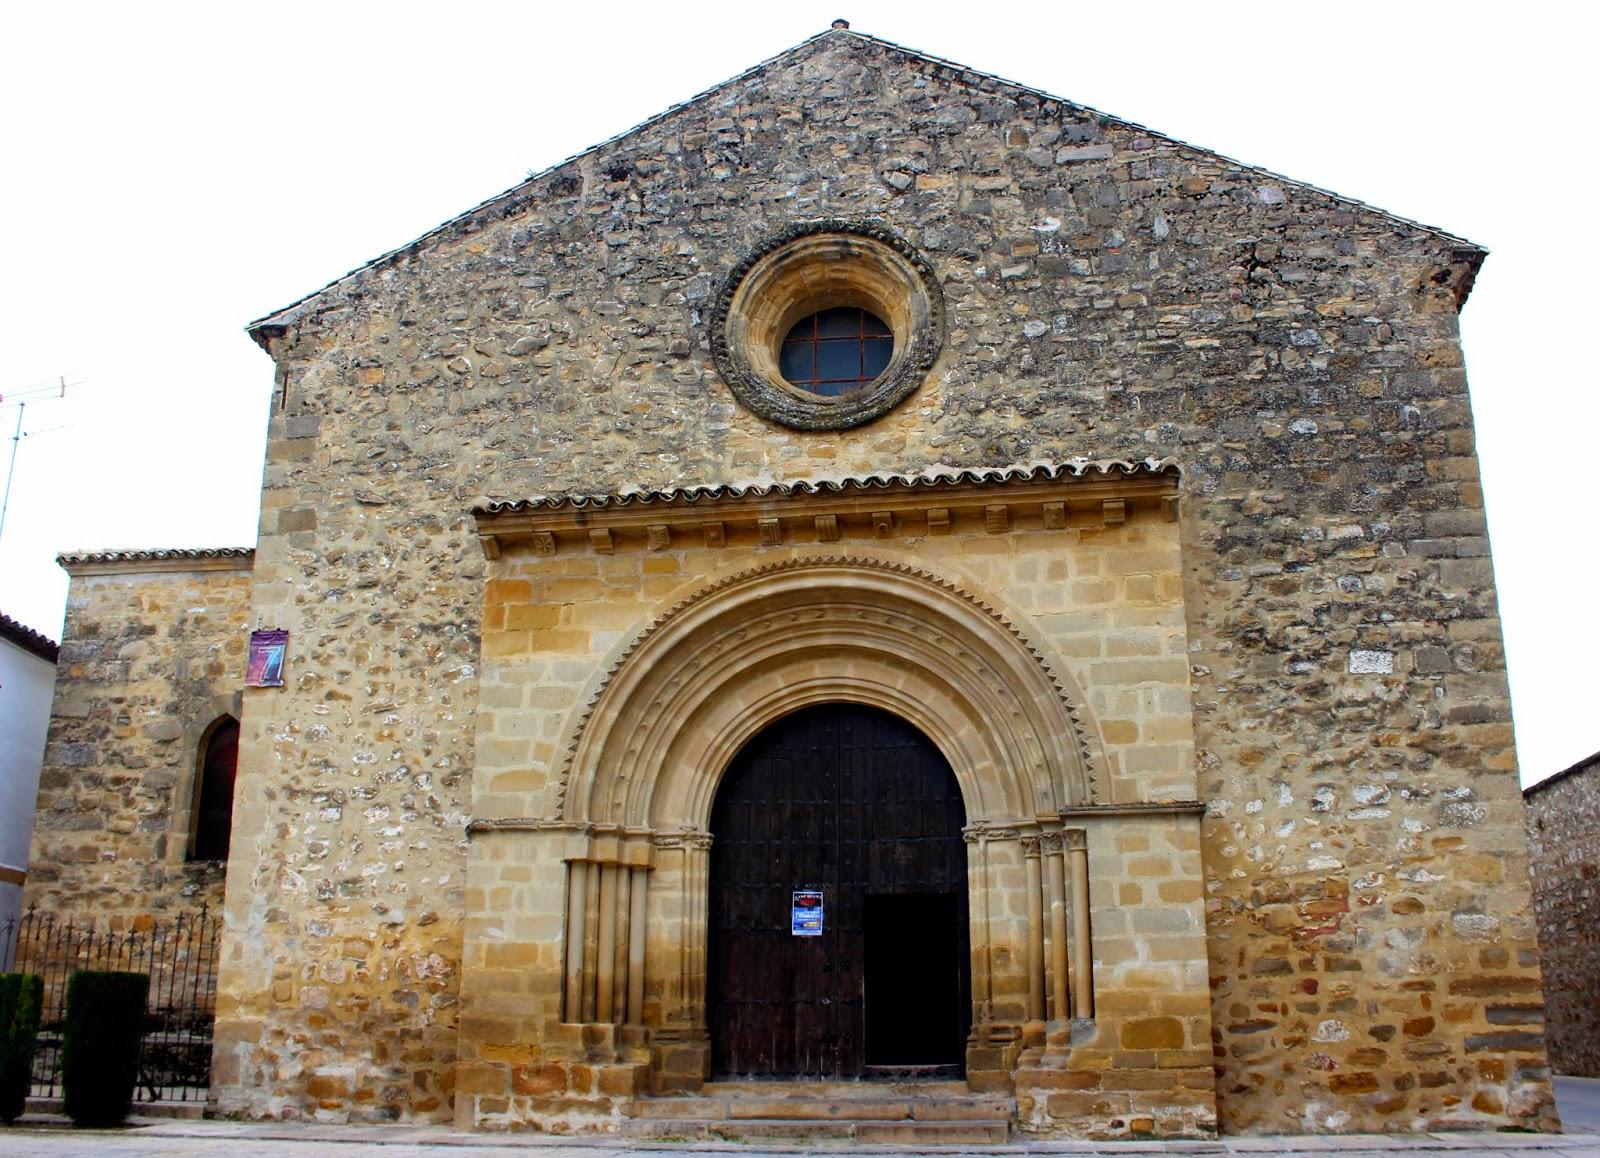 Iglesia de la Santa Cruz en Baeza, Portada de la iglesia de San Juan Bautista